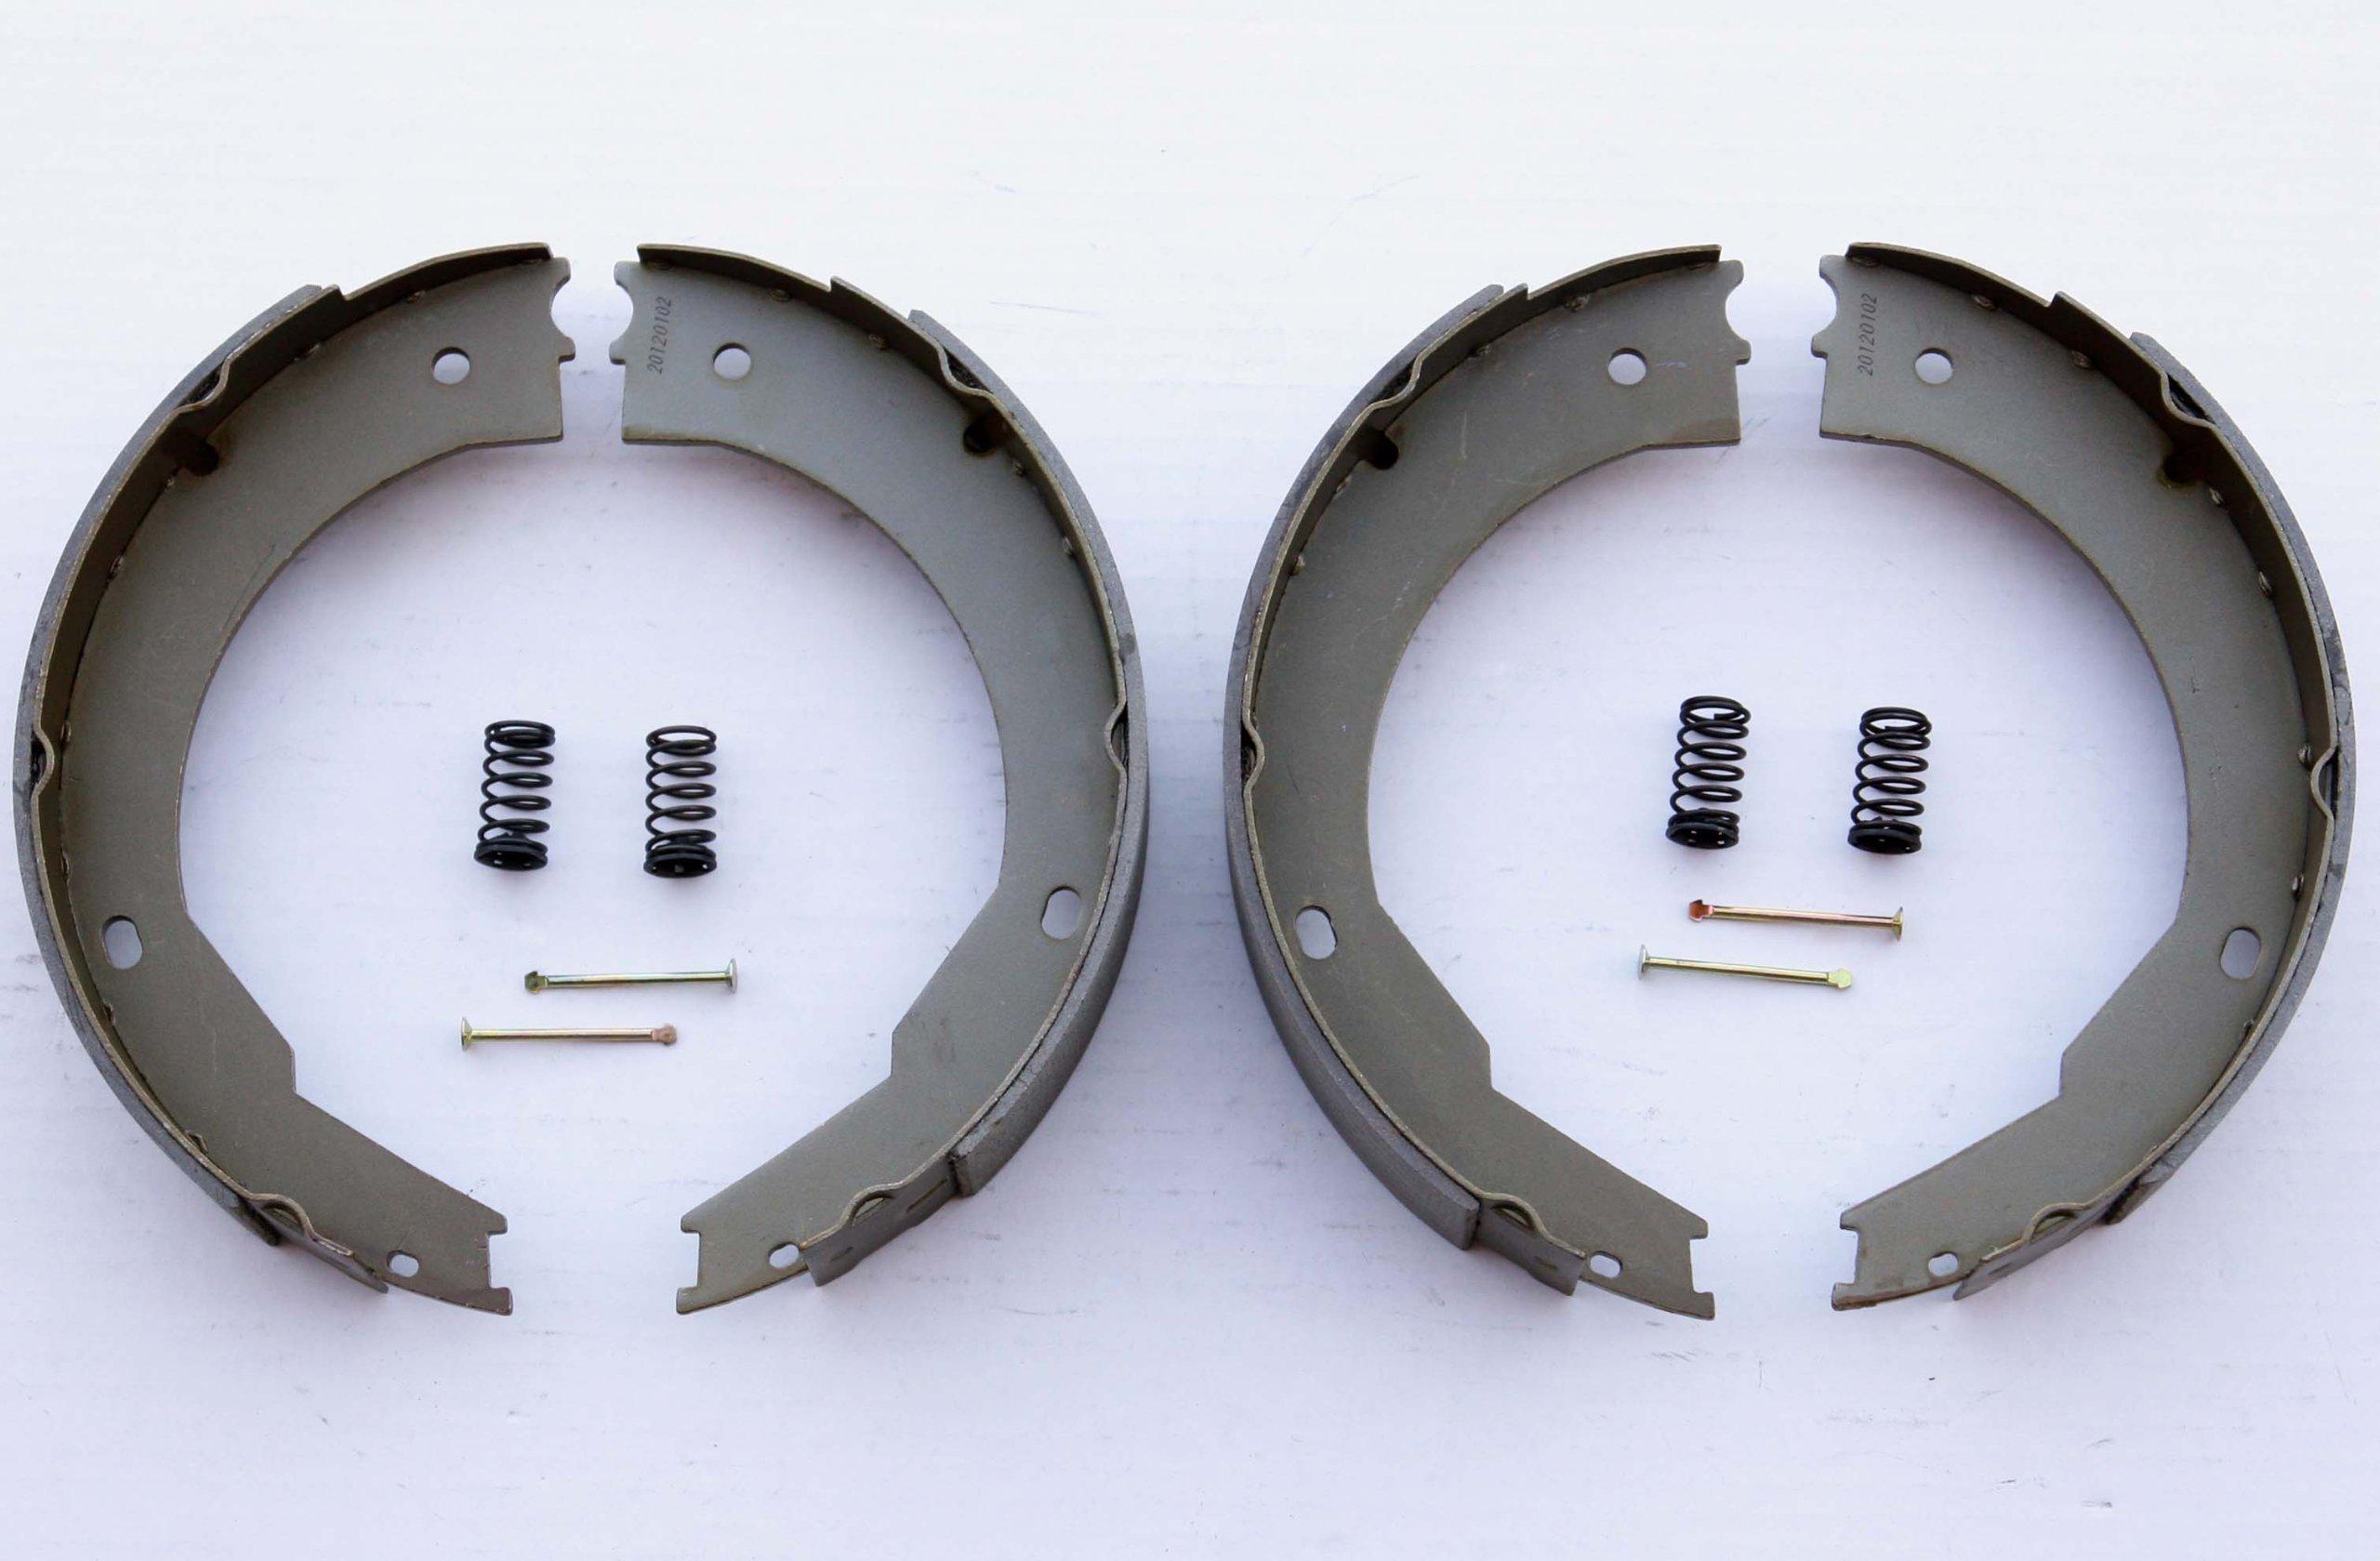 LIBRA 12'' X 2'' trailer brake shoes replacement kits (2 pairs) - 21029/21042